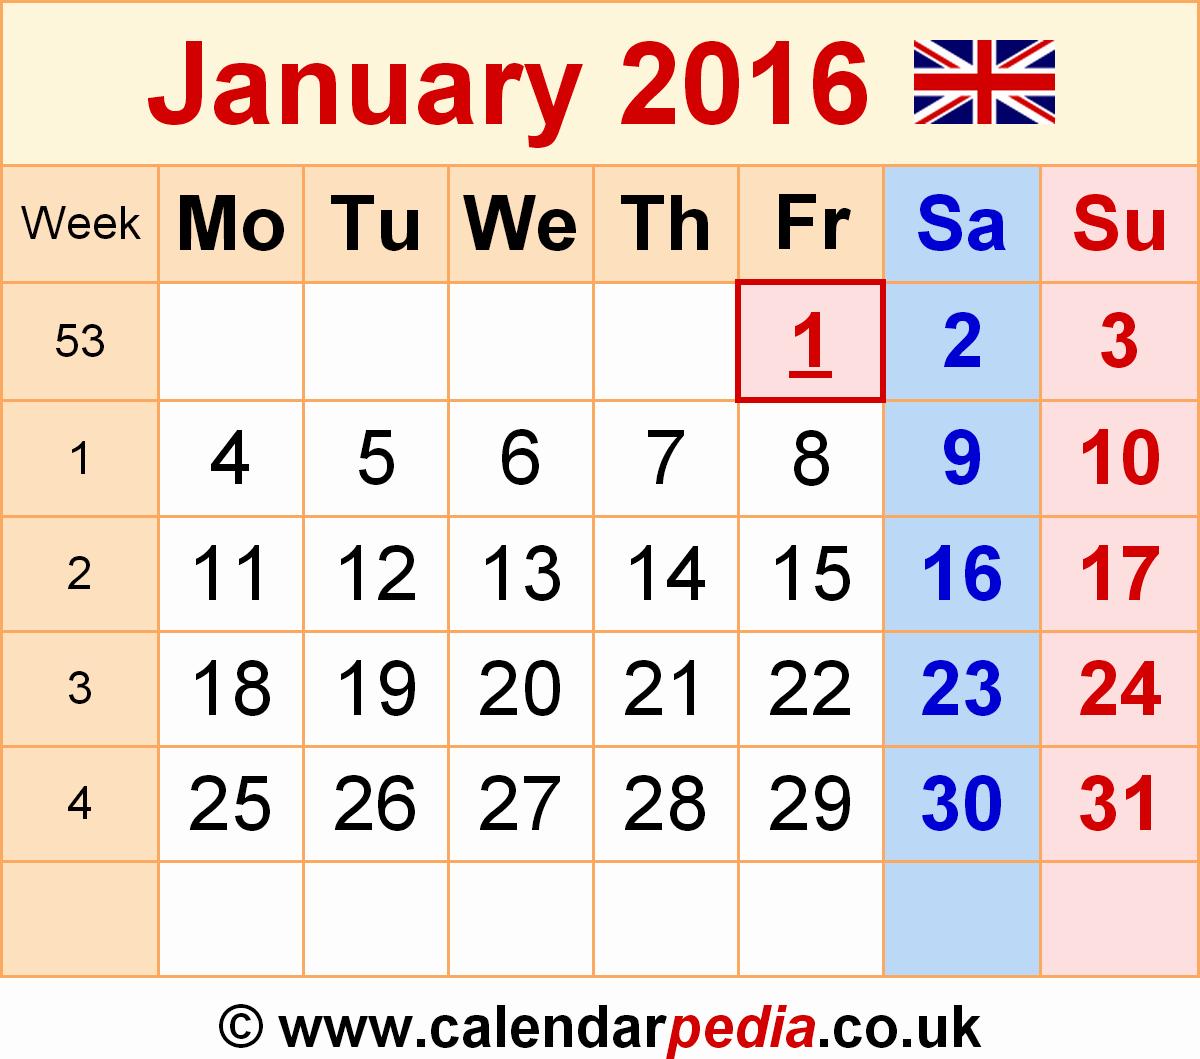 January 2016 Calendar Template Word Beautiful Calendar January 2016 Uk Bank Holidays Excel Pdf Word